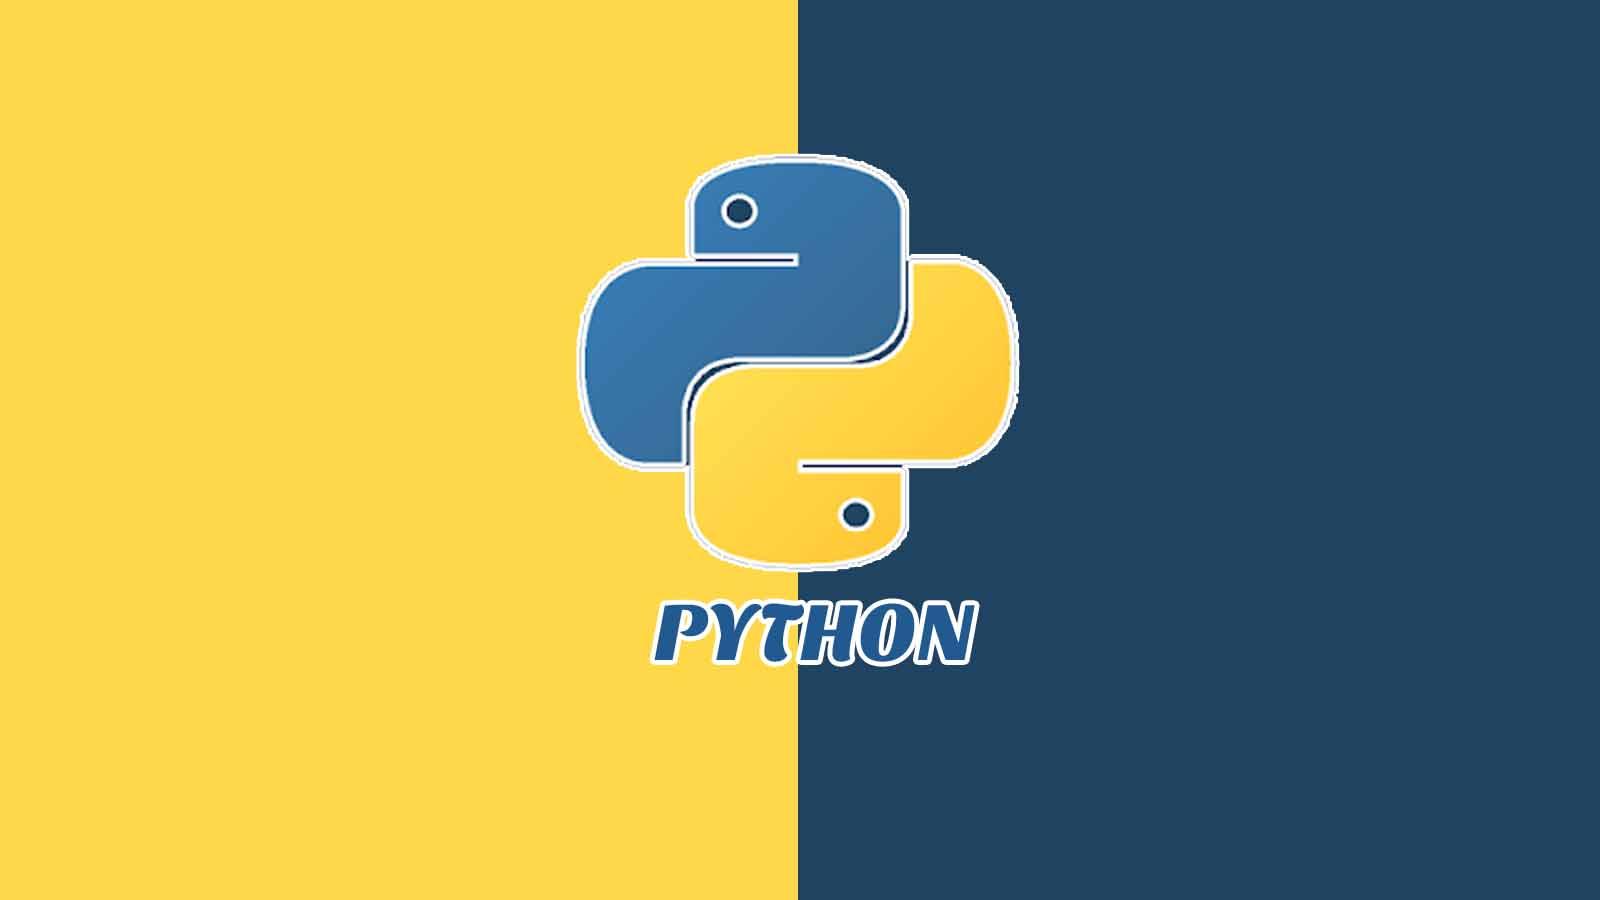 Daftar Isi - Python